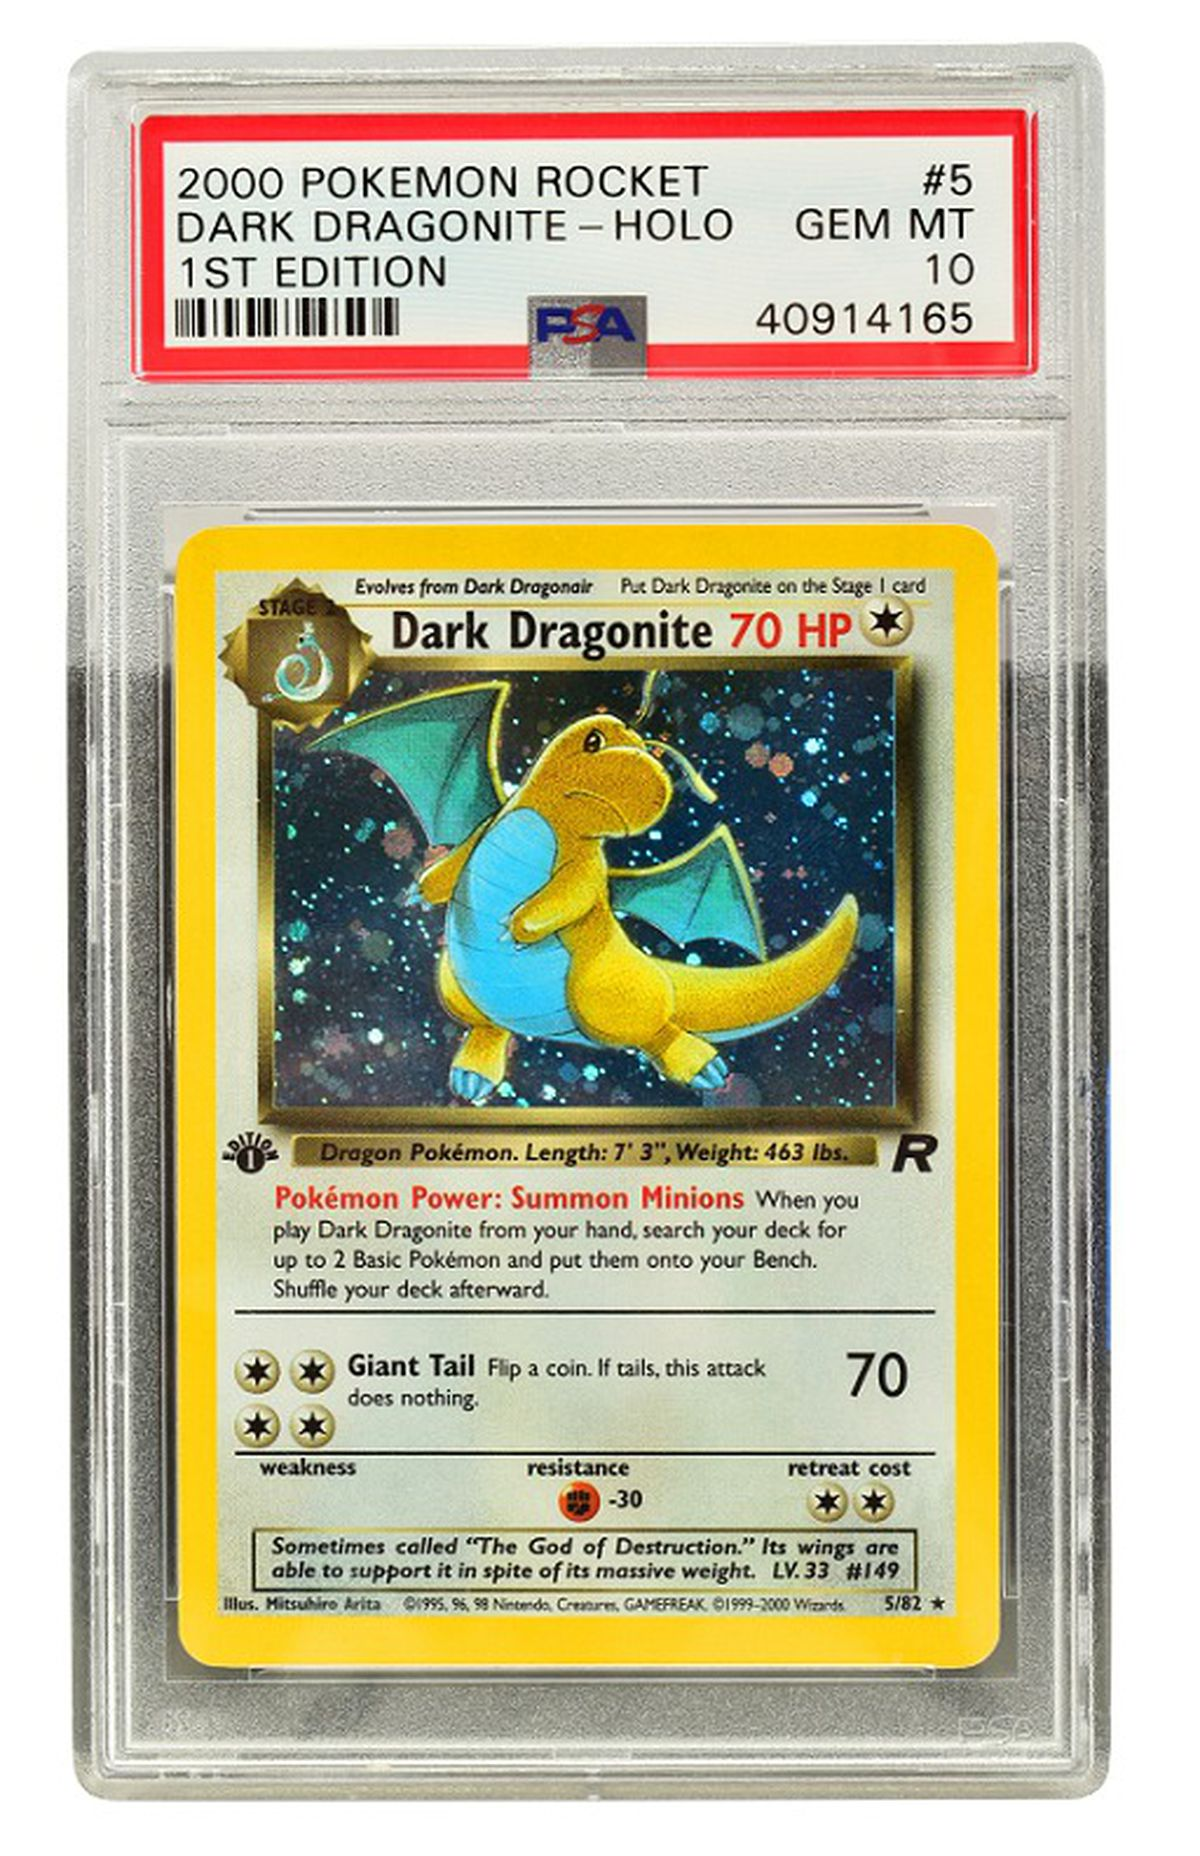 A 1st edition Team Rocket Dark Dragonite Holo, PSA Gem Mint 10, estimated to make £2,000-£3,000.